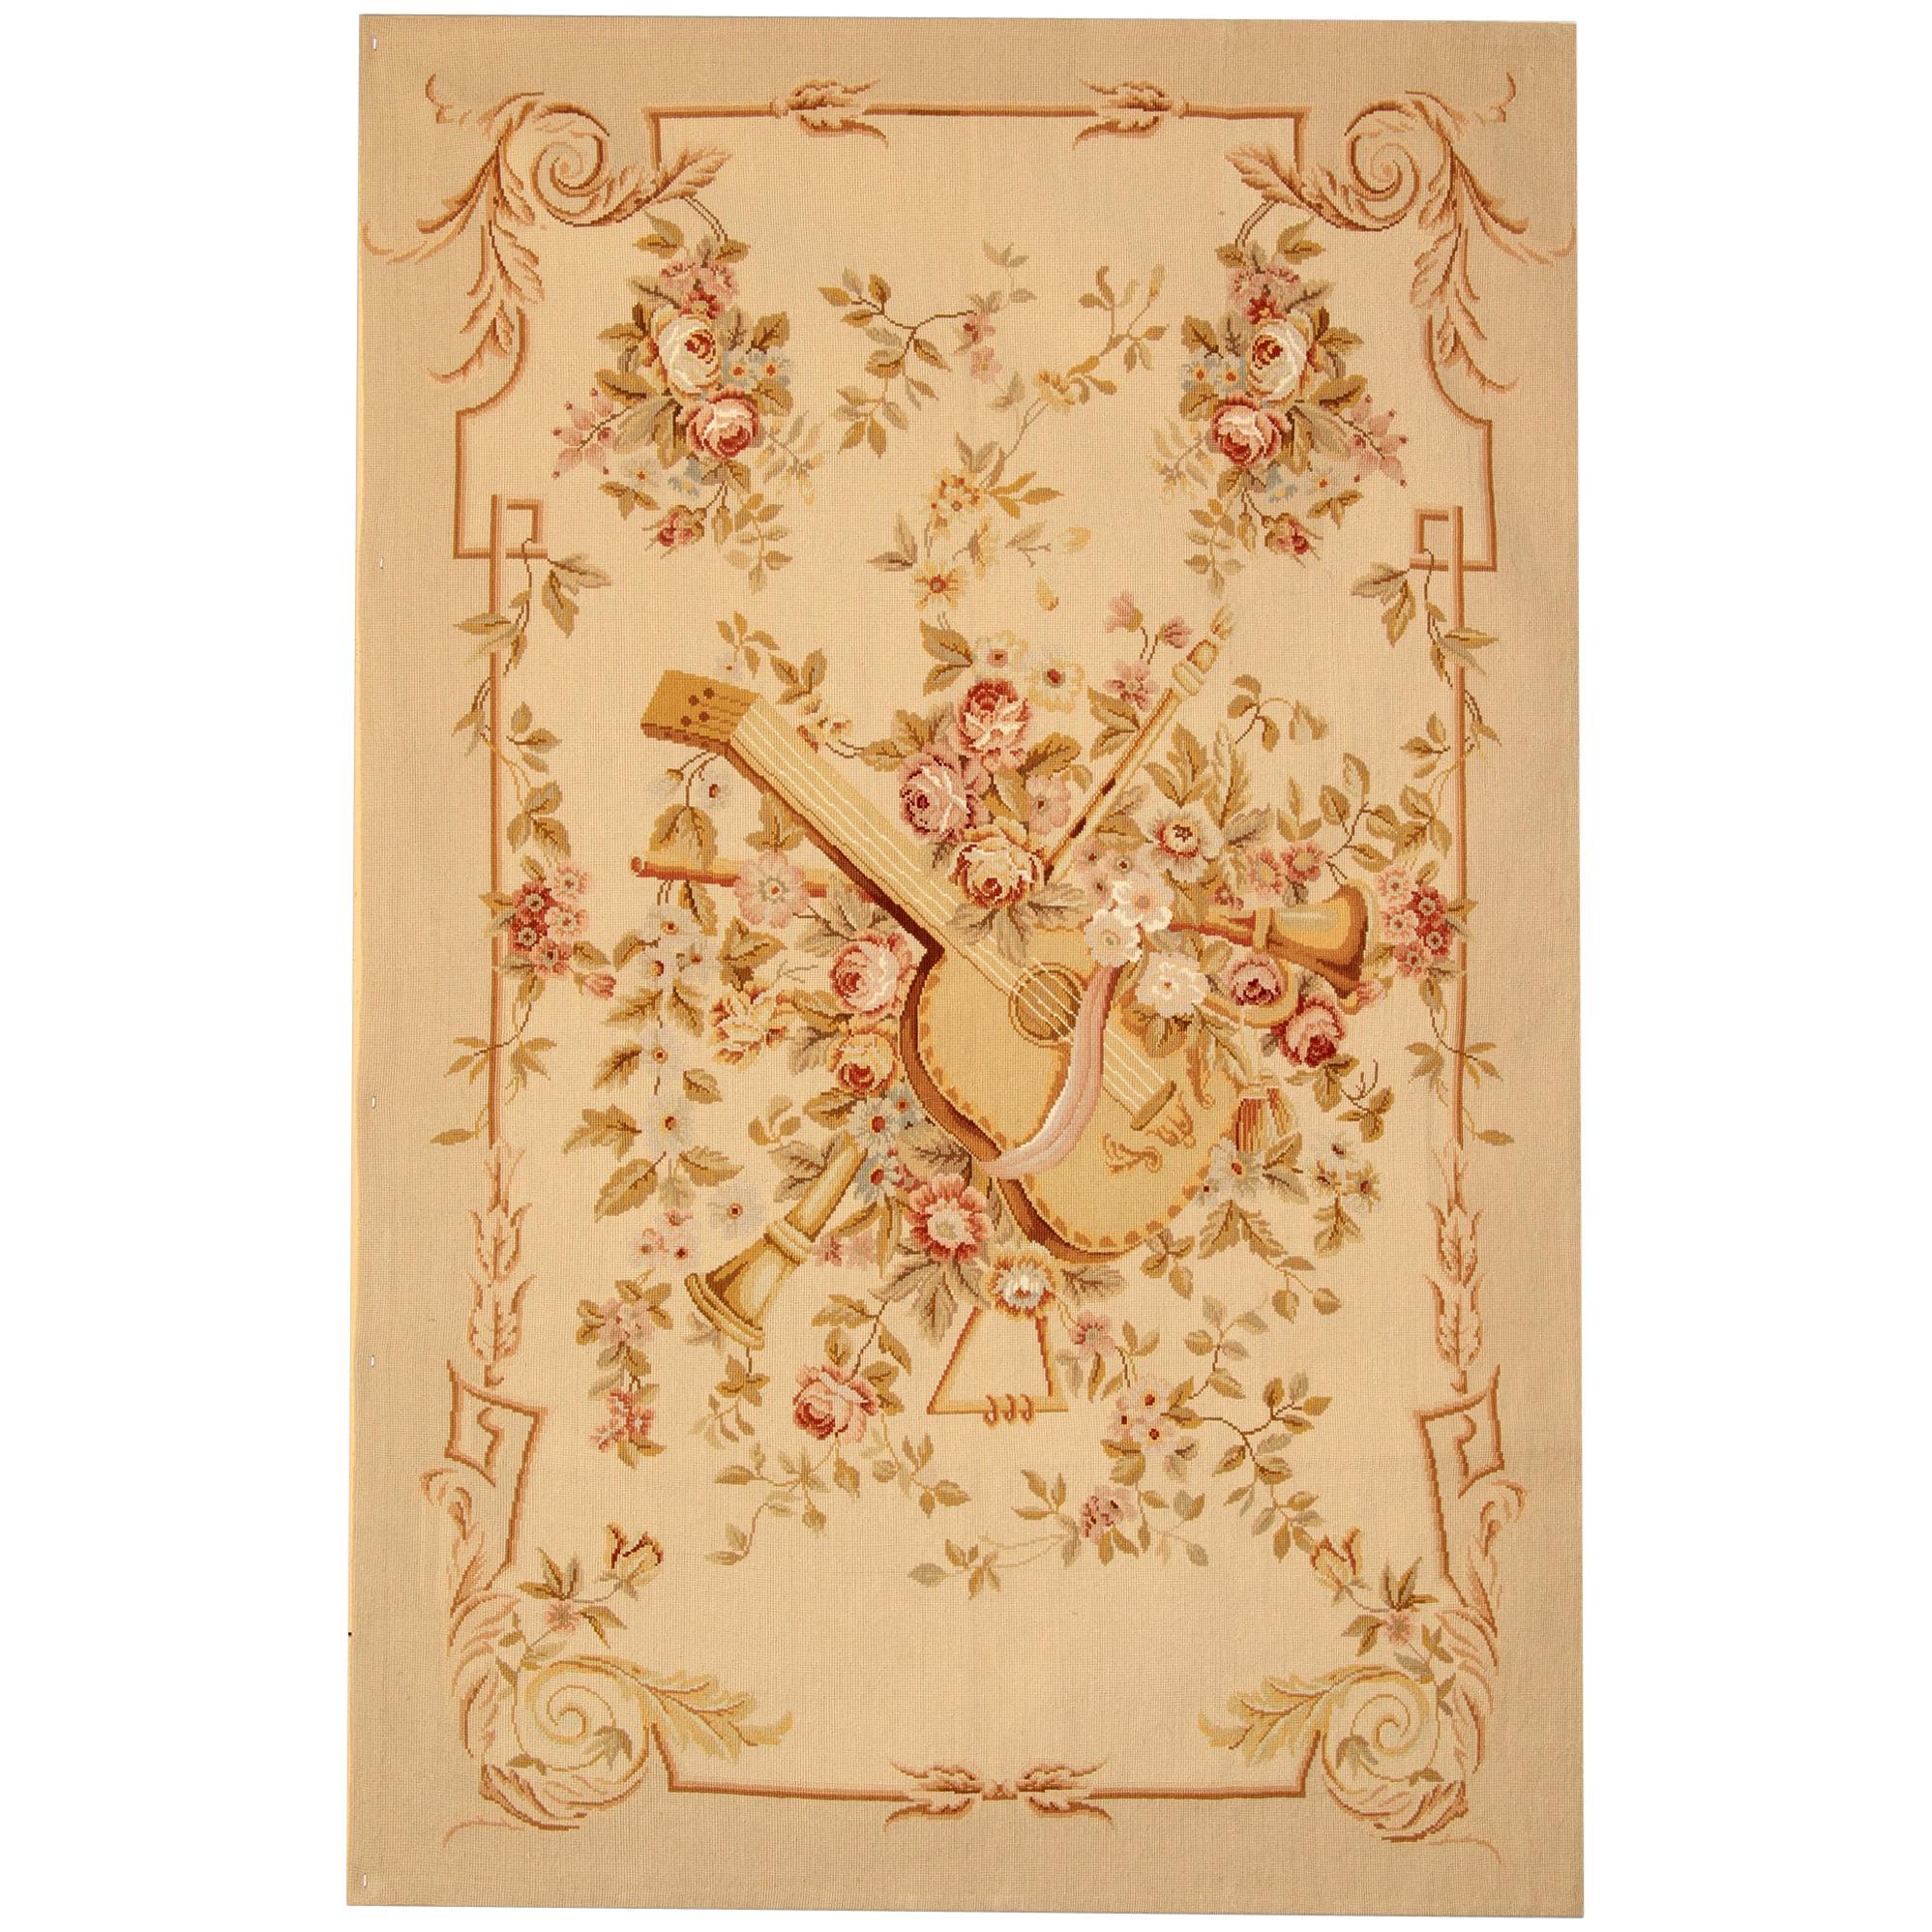 Aubusson Style Rug Floral Carpet Interior Home Decor